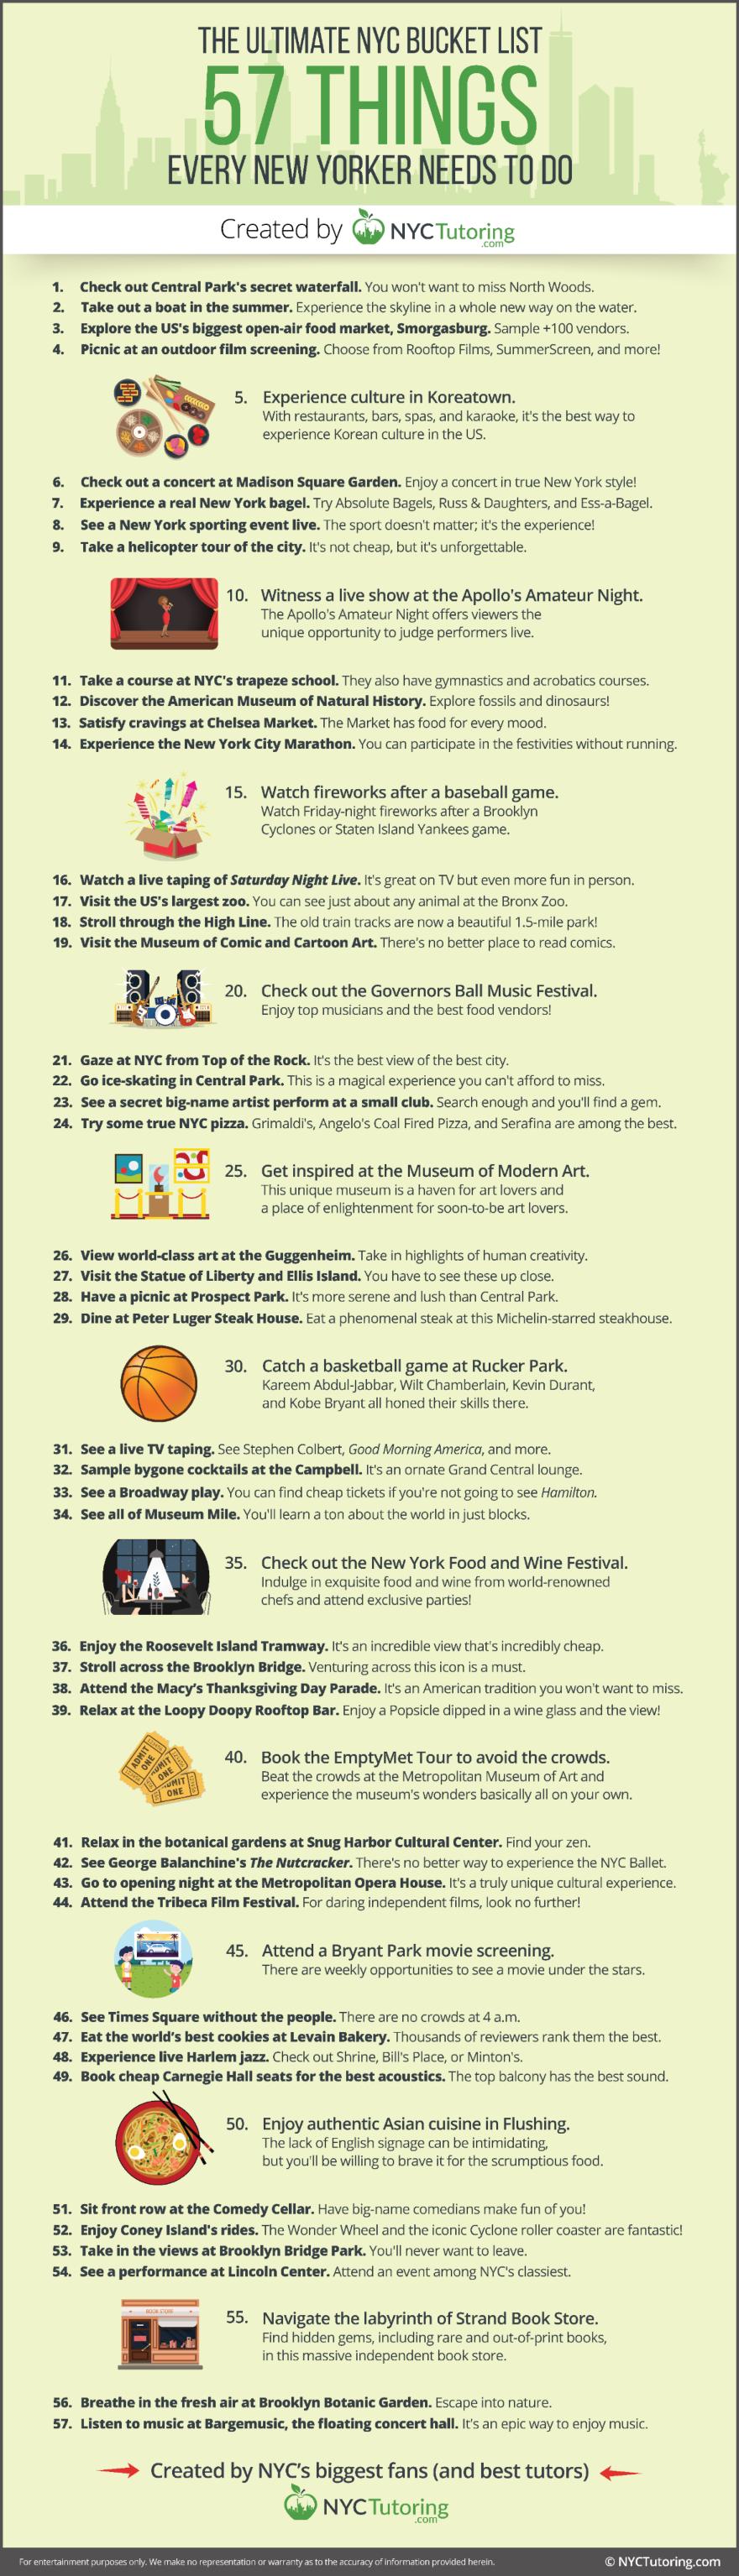 The Ultimate NYC Bucket List